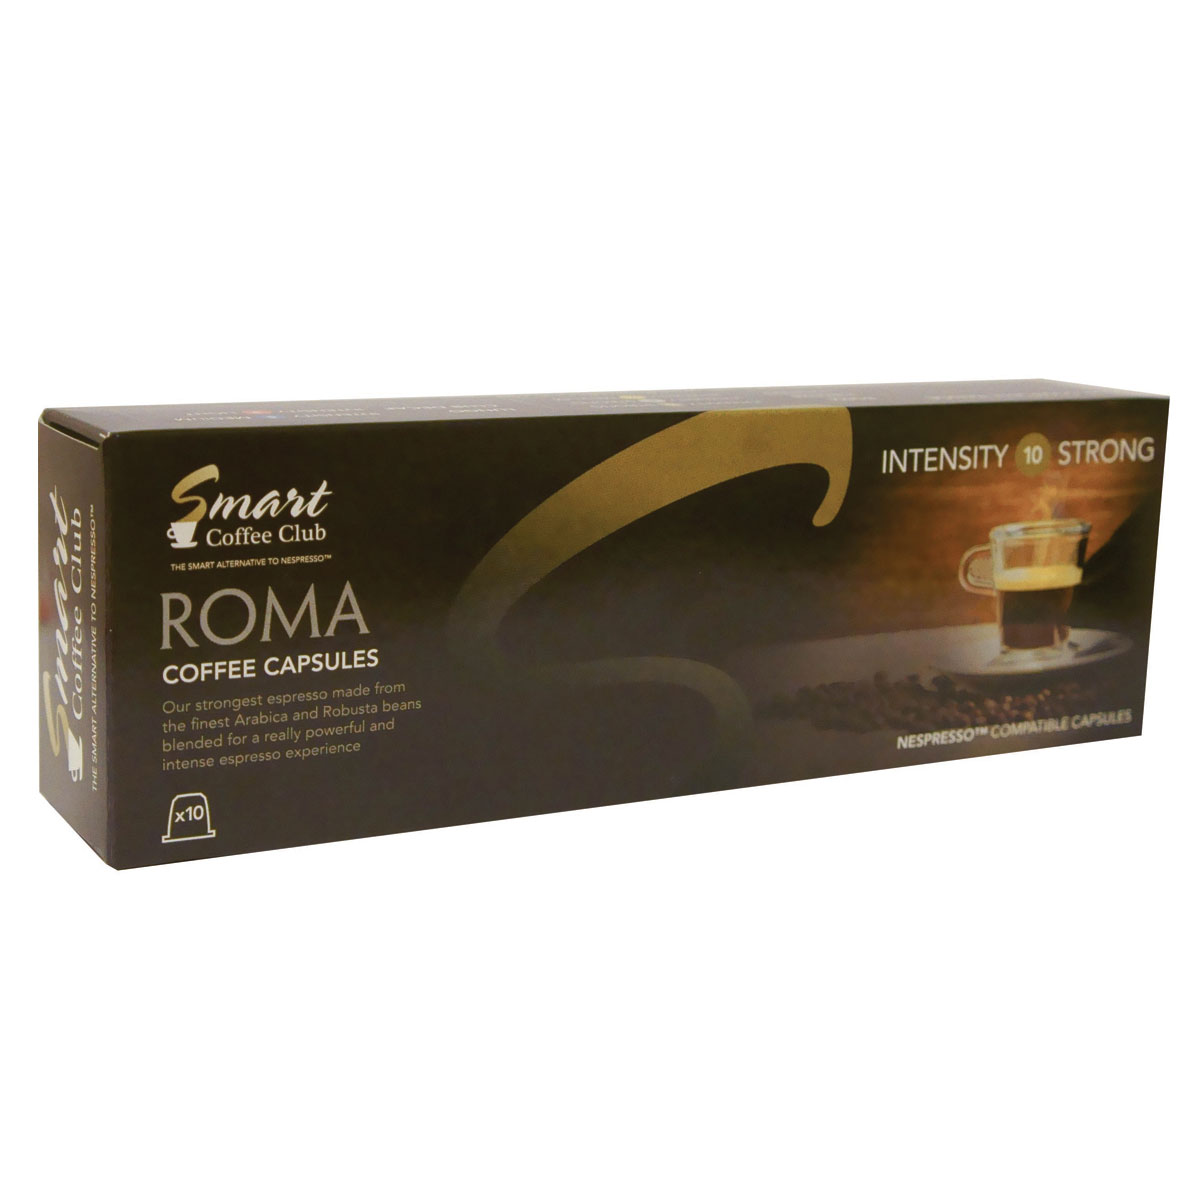 Smart Coffee Club Roma кофе в капсулах, 10 штук капсулы для кофемашин smart coffee club roma 10 капсул